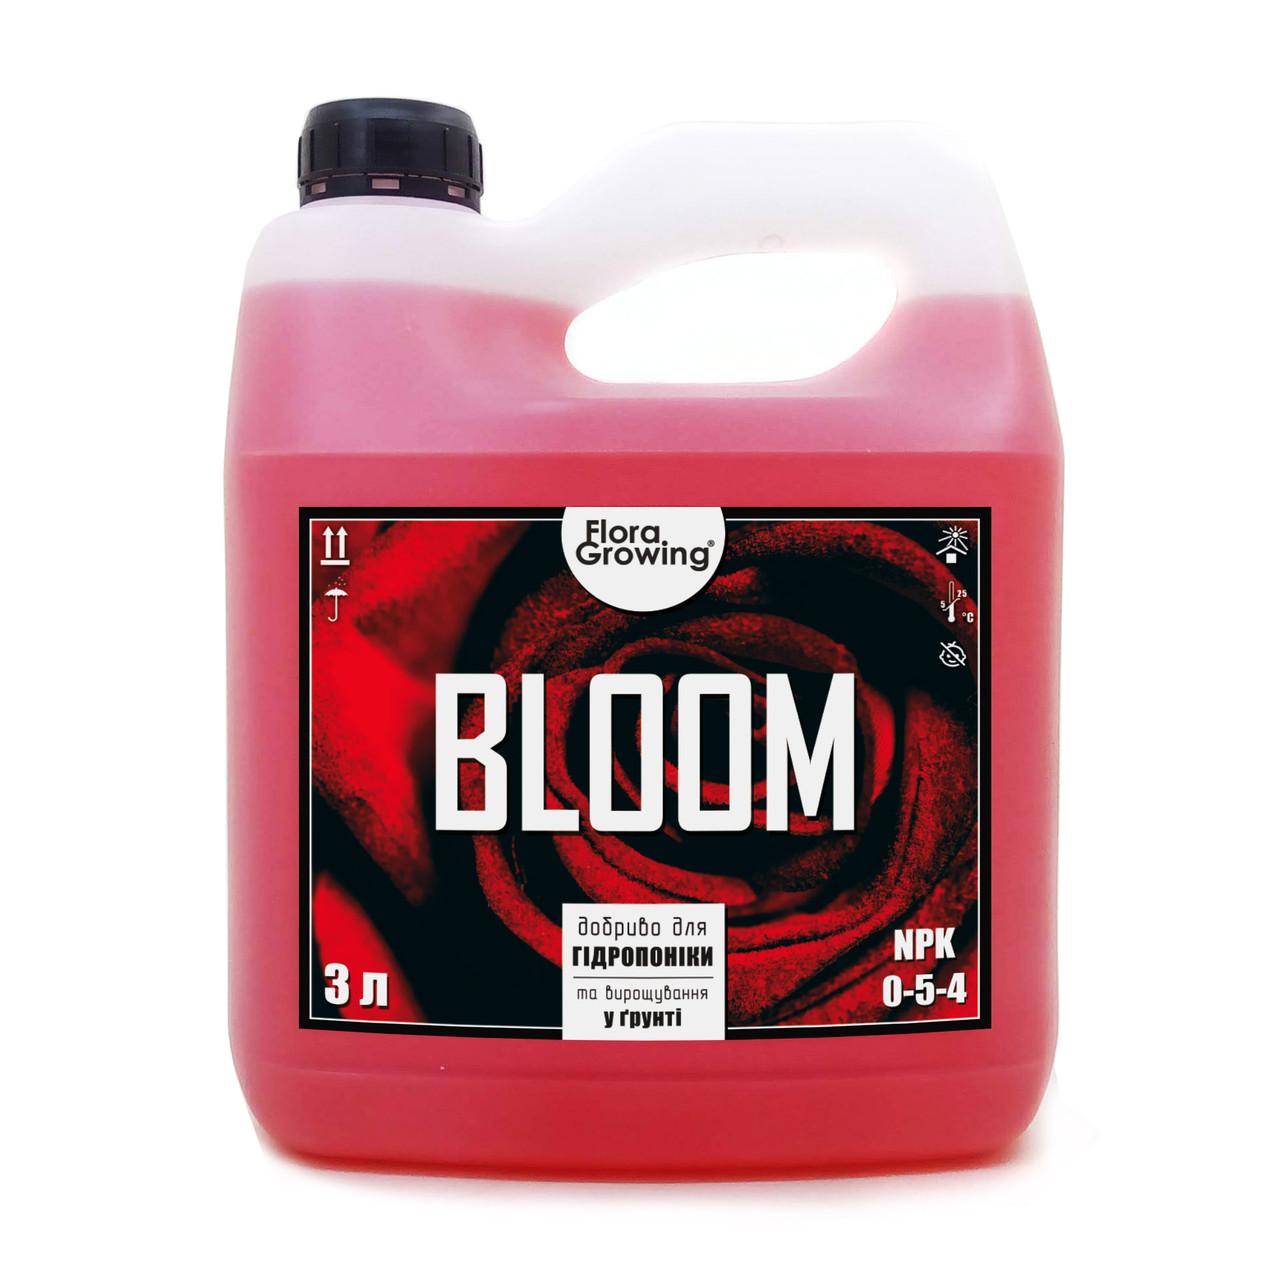 3 л Bloom - компонент удобрений для гидропоники и почвы аналог GHE